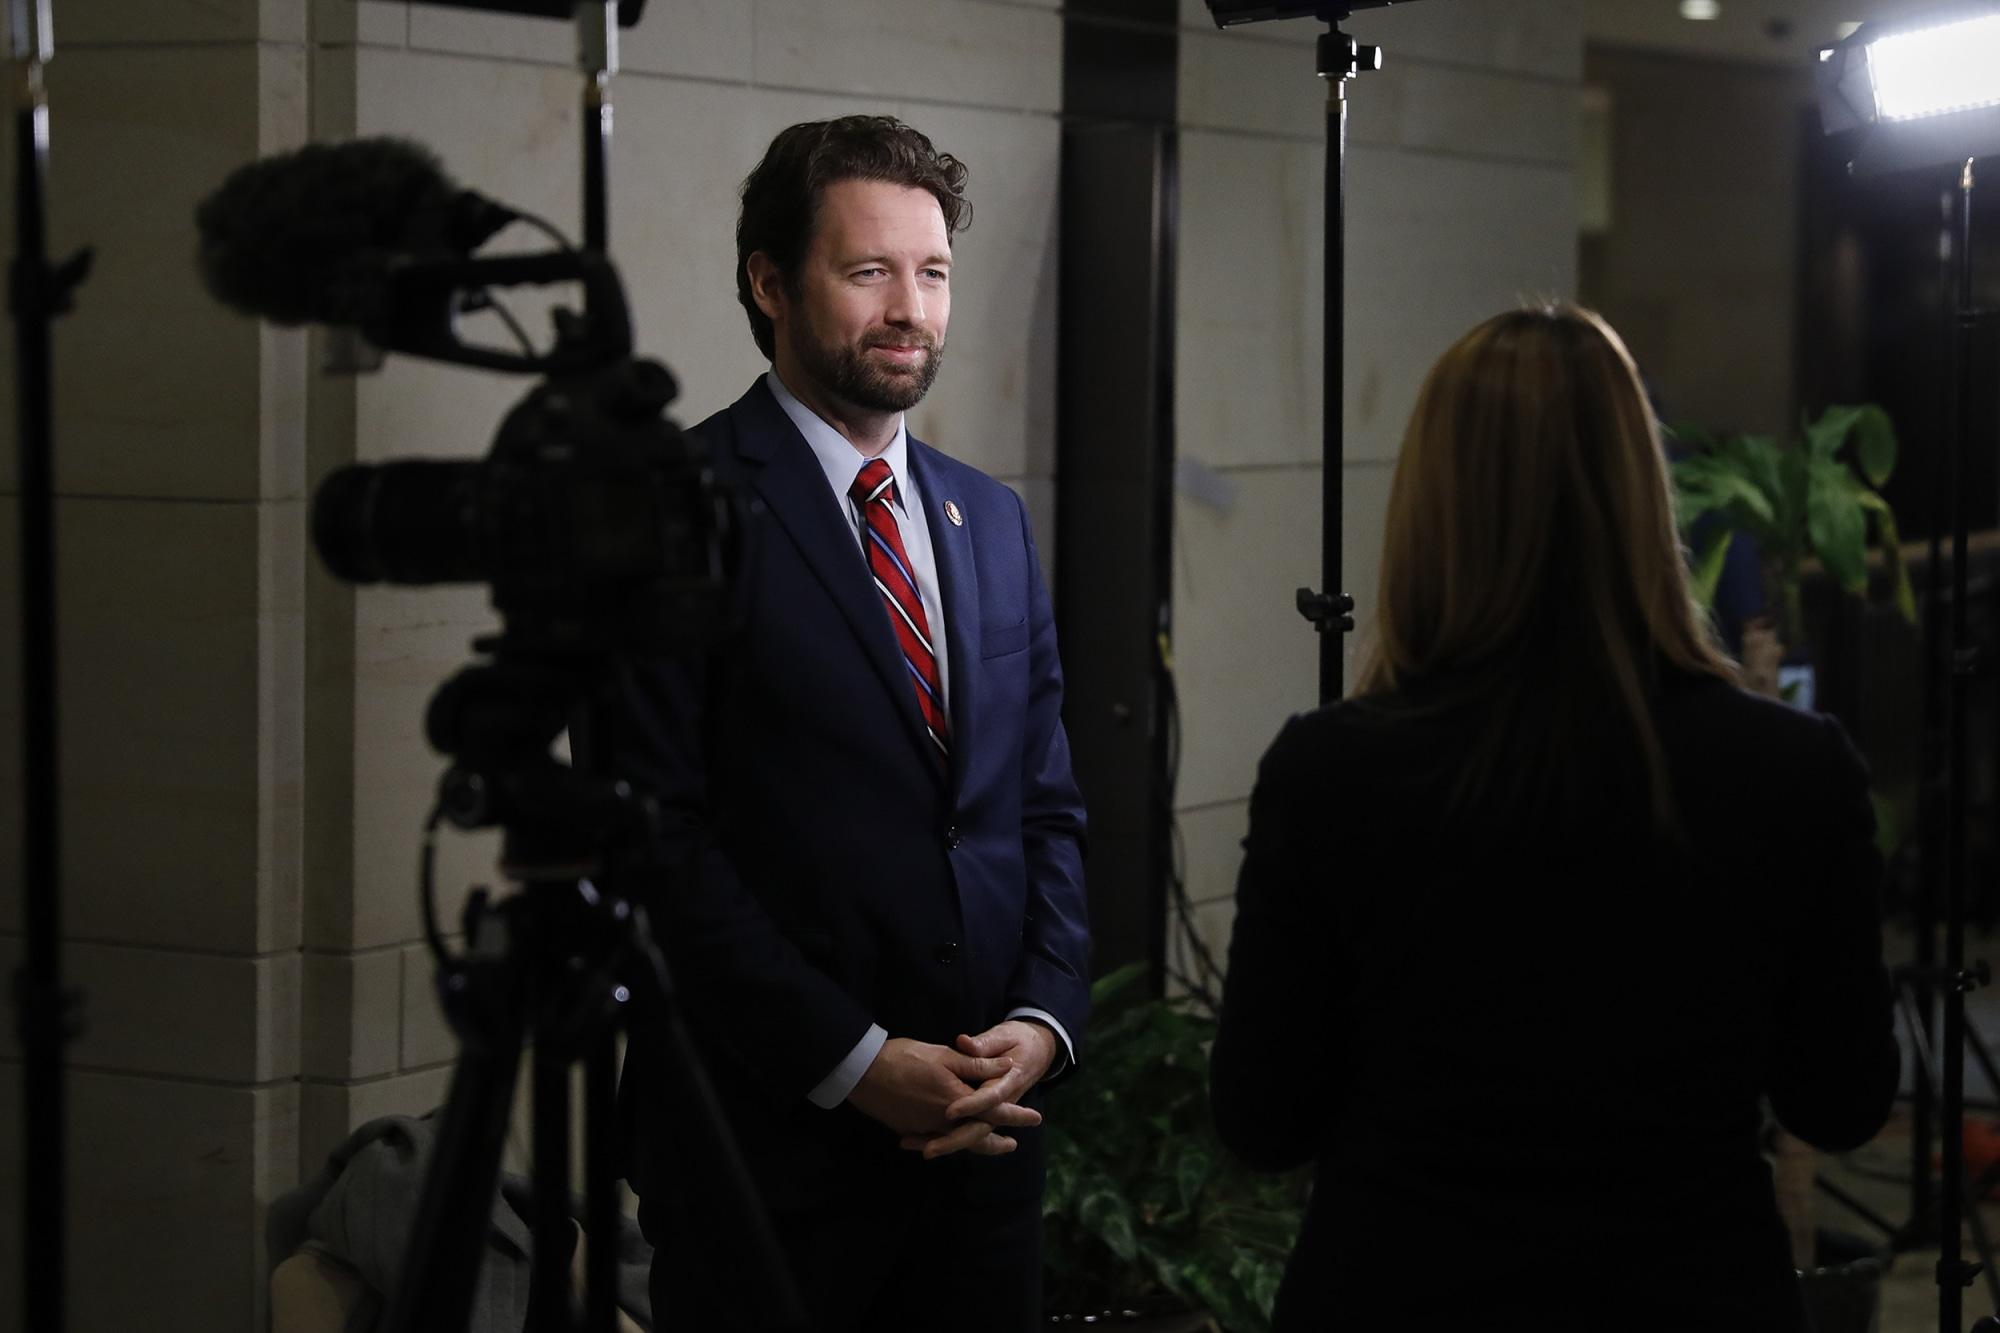 NBC – How worried should a Trump-district Democrat be about impeachment?